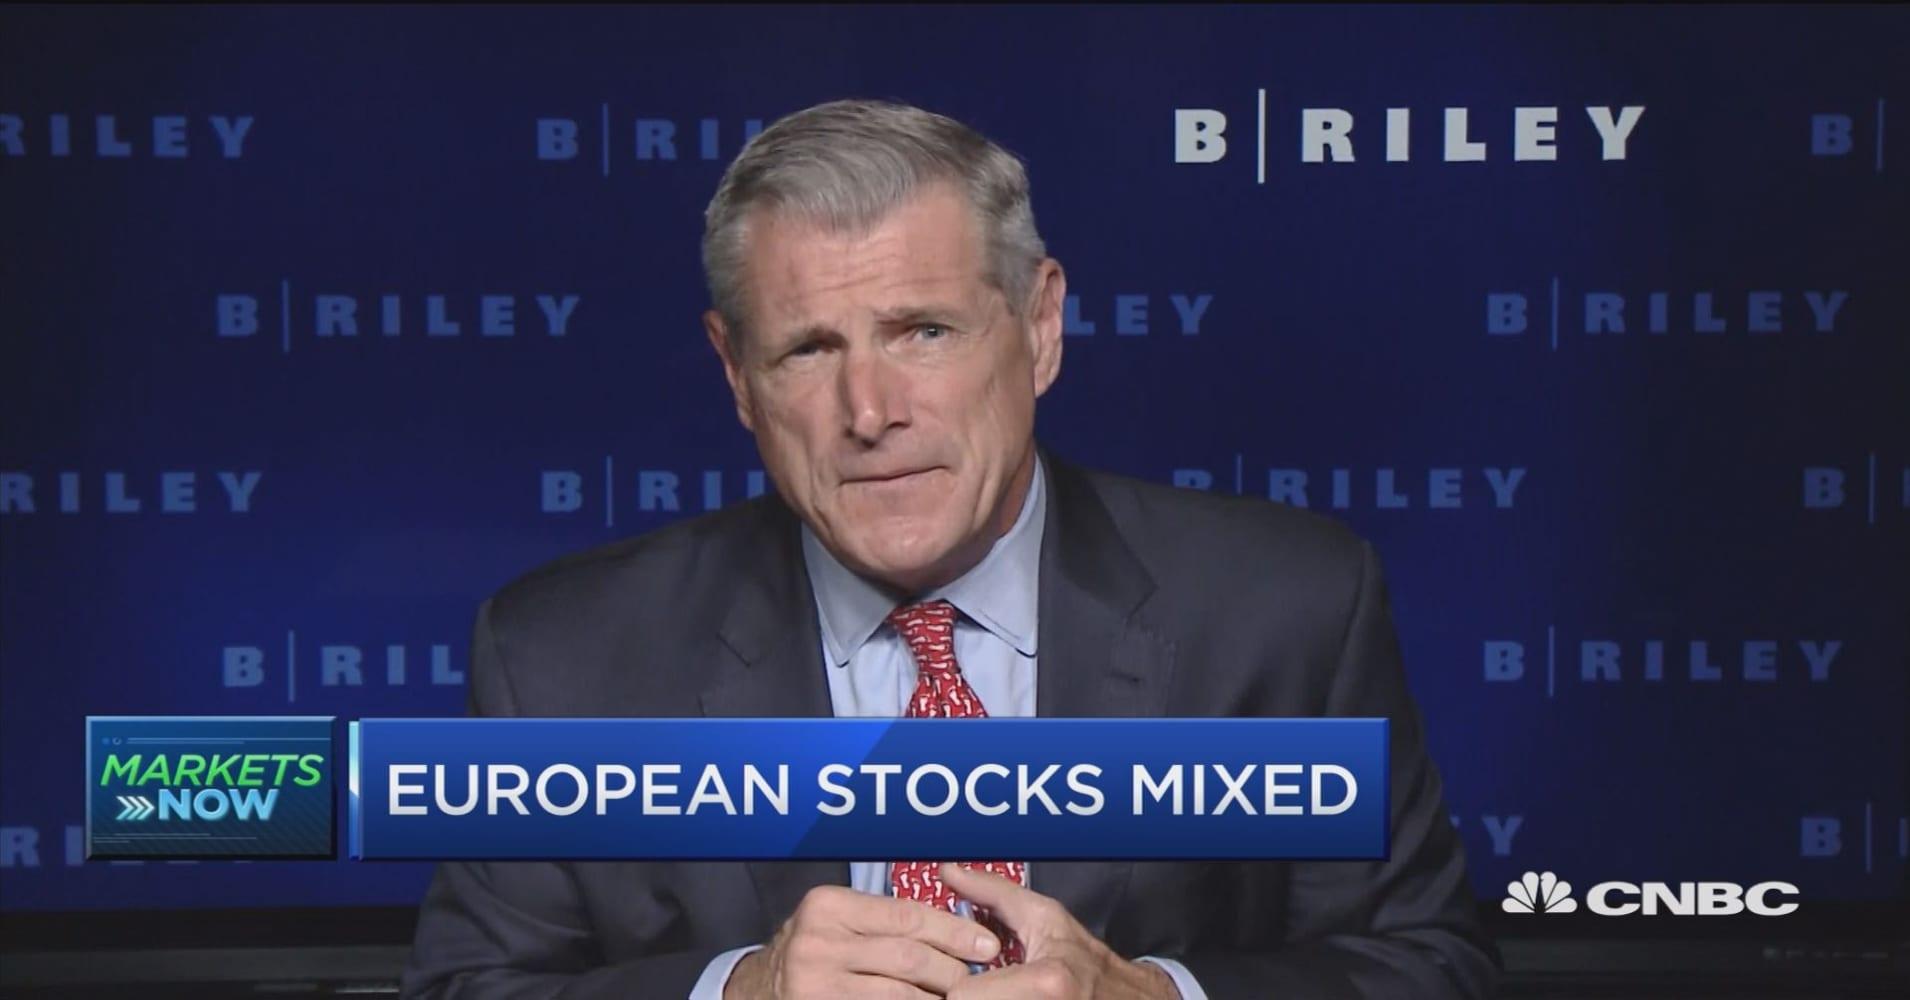 Hogan: Worst-case scenario on US-EU trade talks not priced into the markets  right now